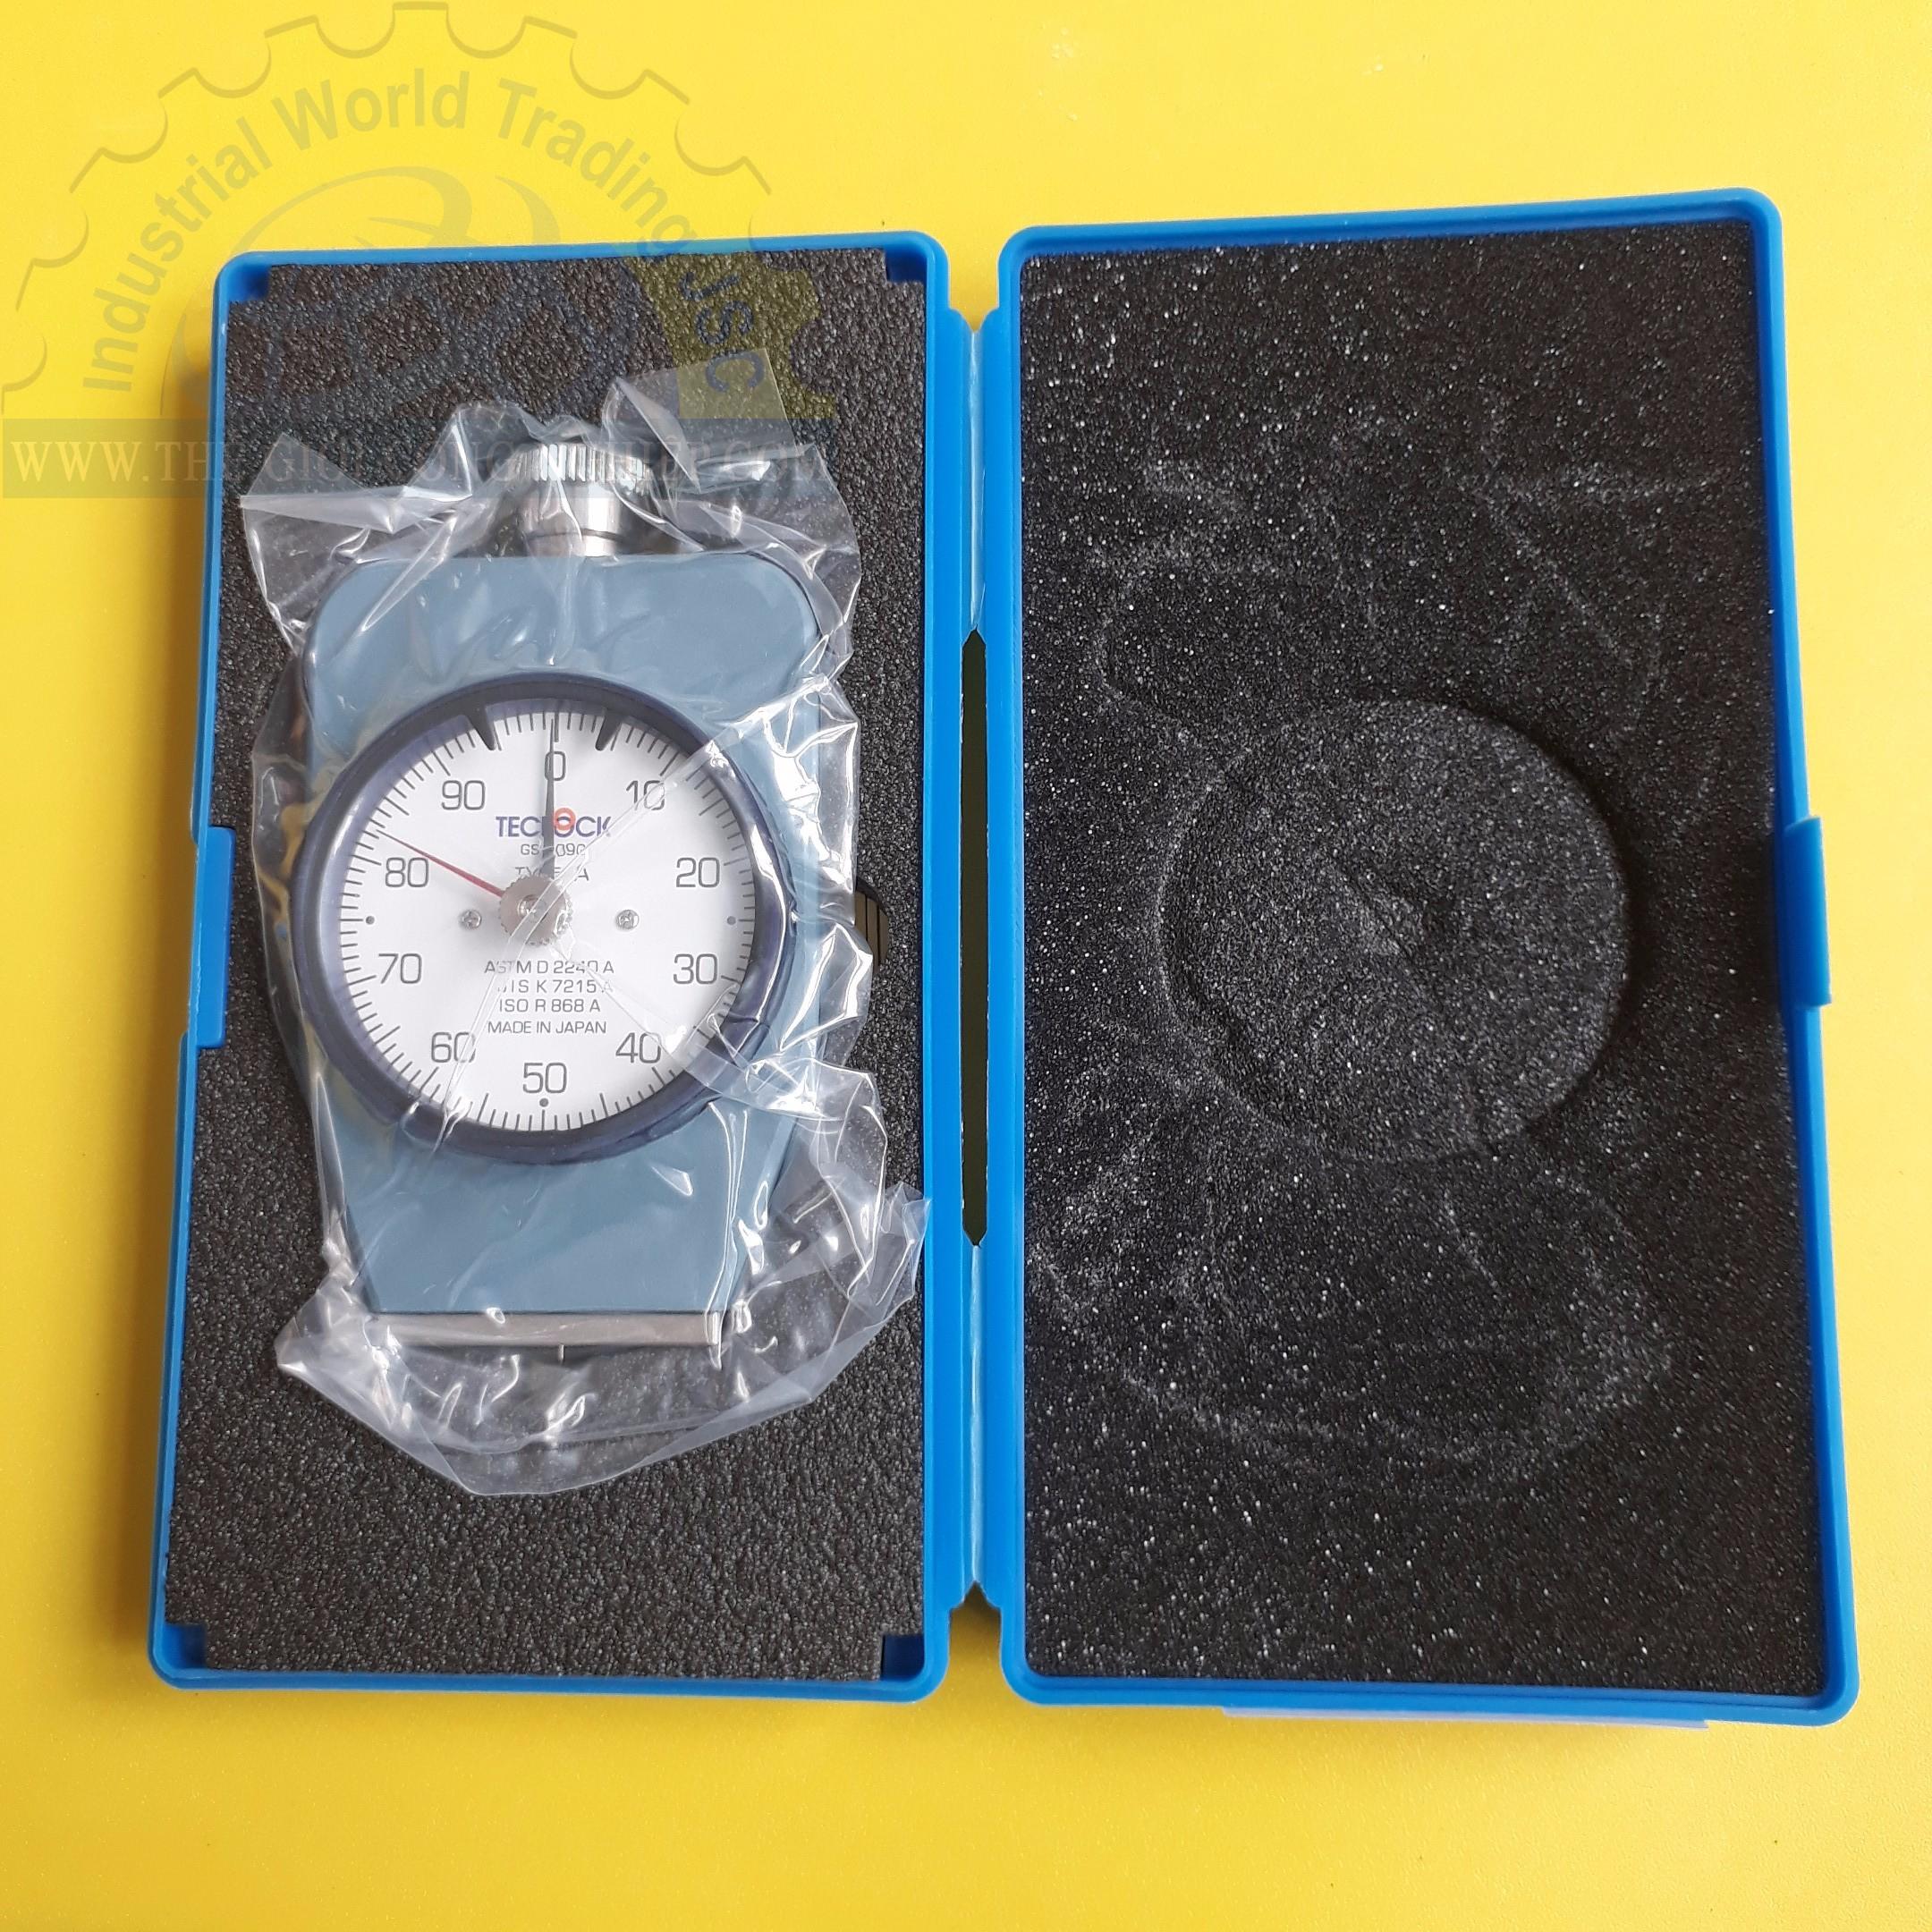 Đồng hồ đo độ cứng cao su loại A  GS-709G Teclock